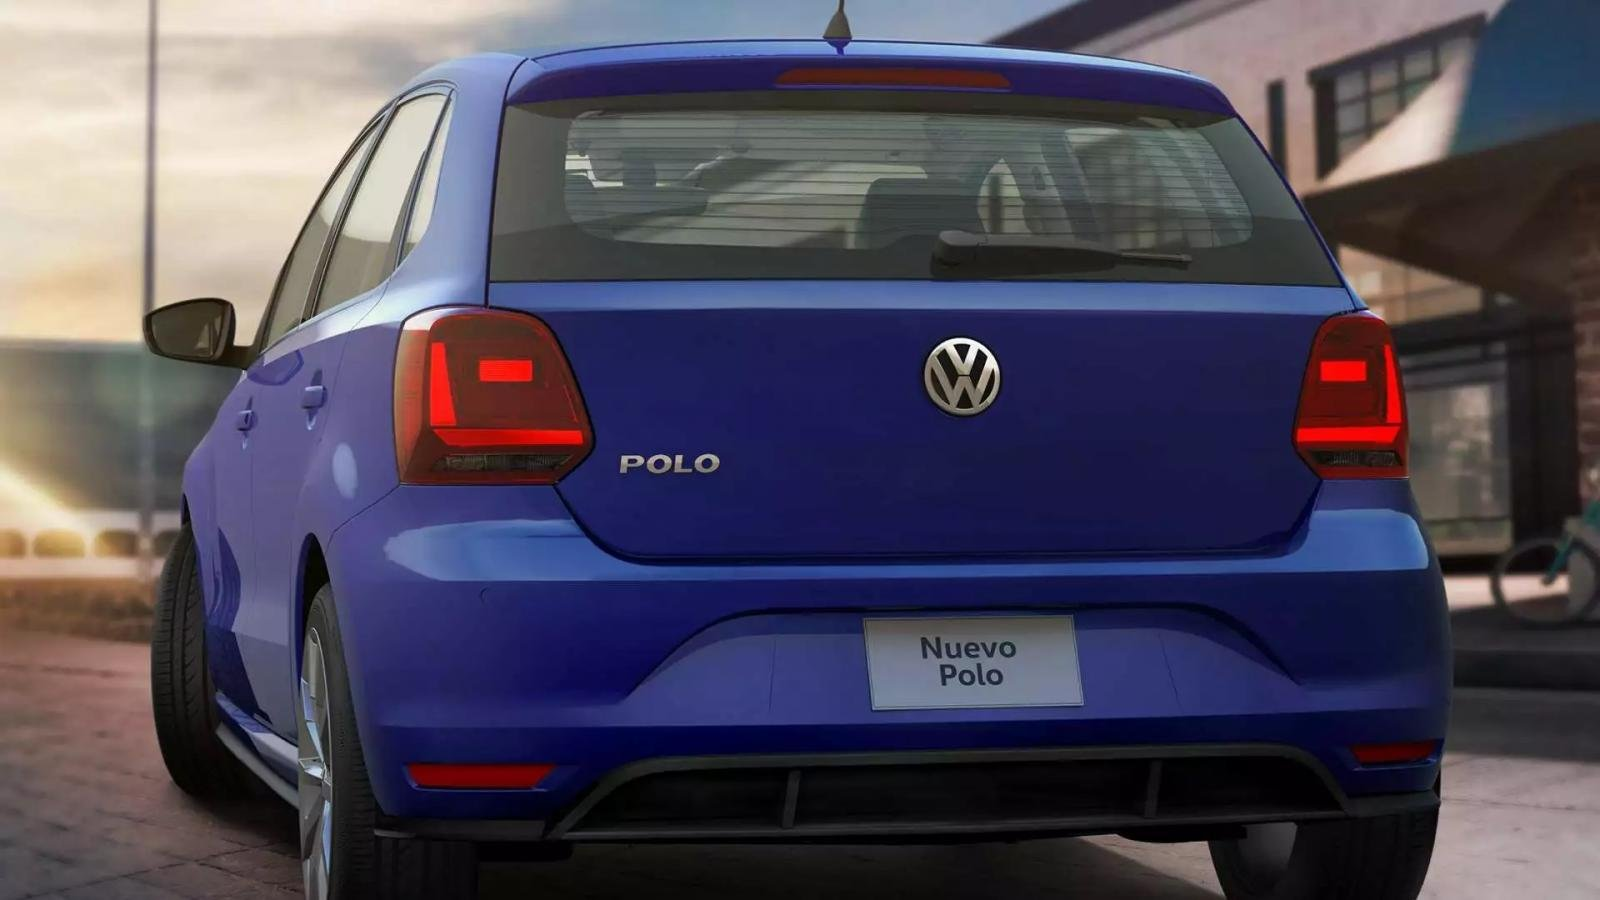 Volkswagen Polo Comfortline Plus 2020 Toyota Yaris HB S CVT 2020 comparativa